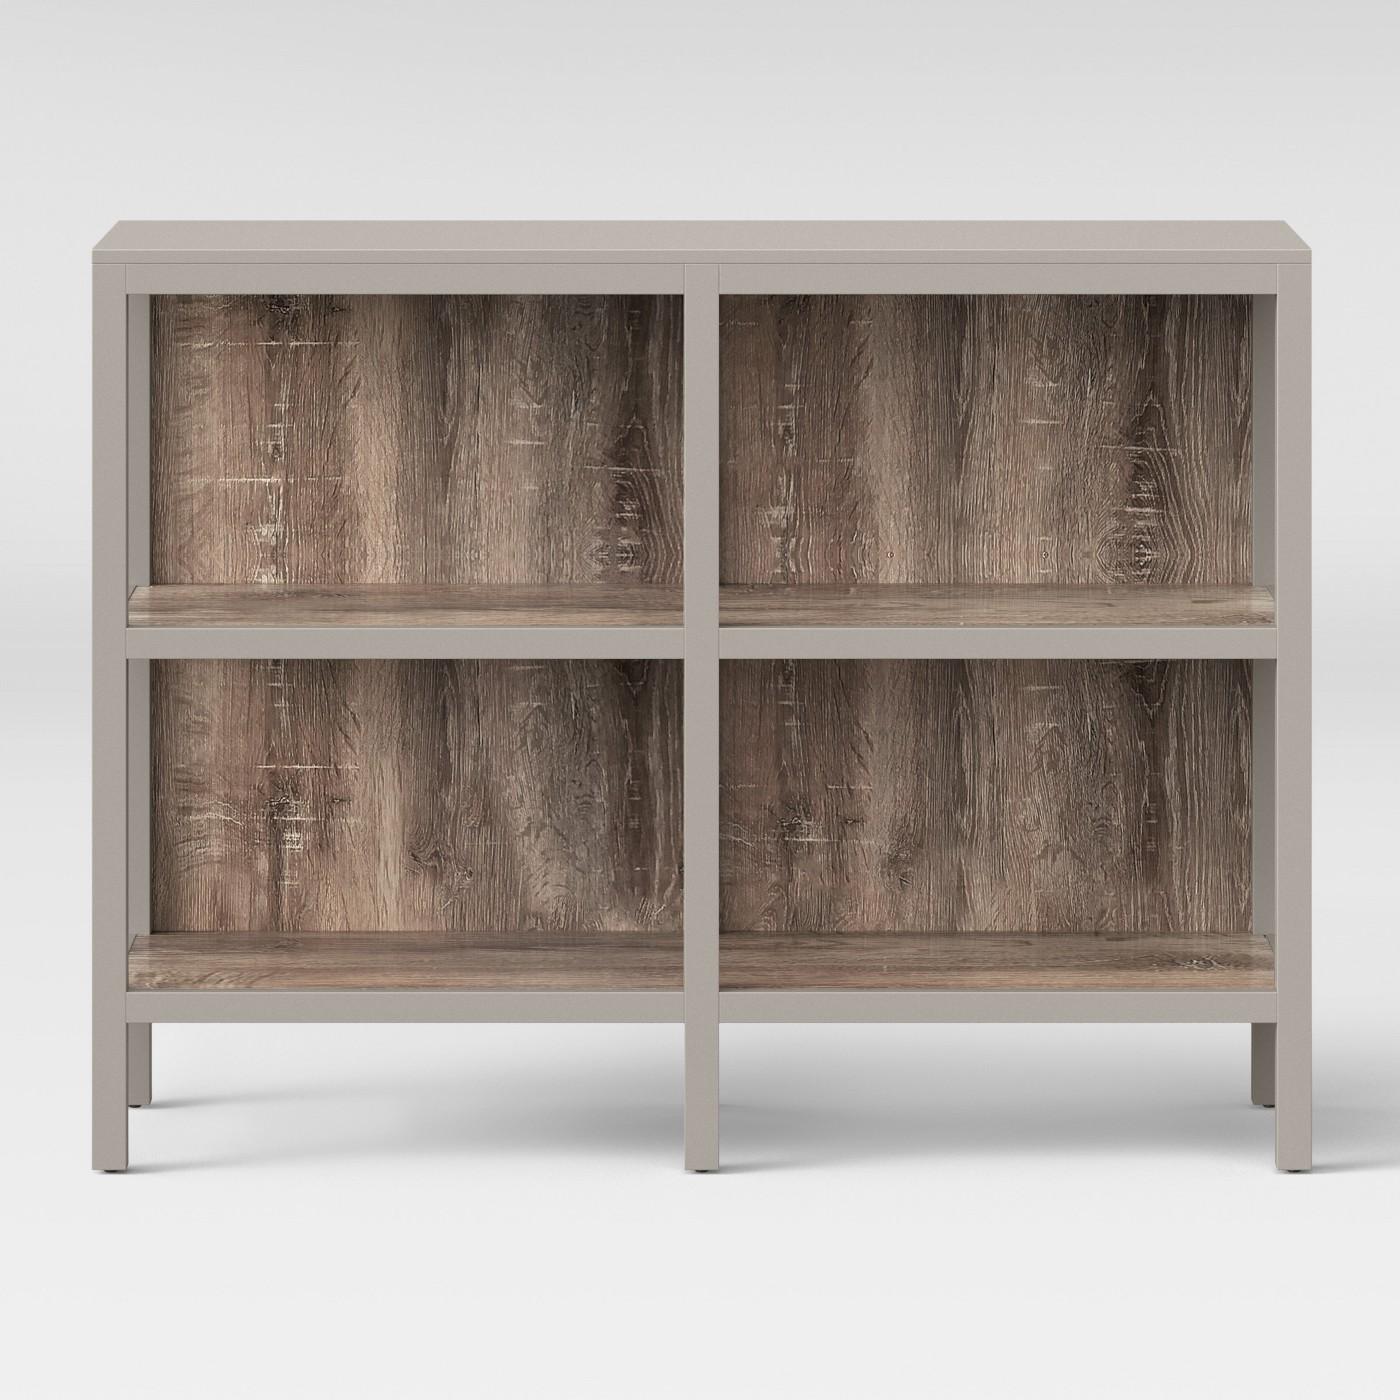 "Hadley 36.2"" Horizontal Bookcase - Threshold⢠- image 1 of 6"